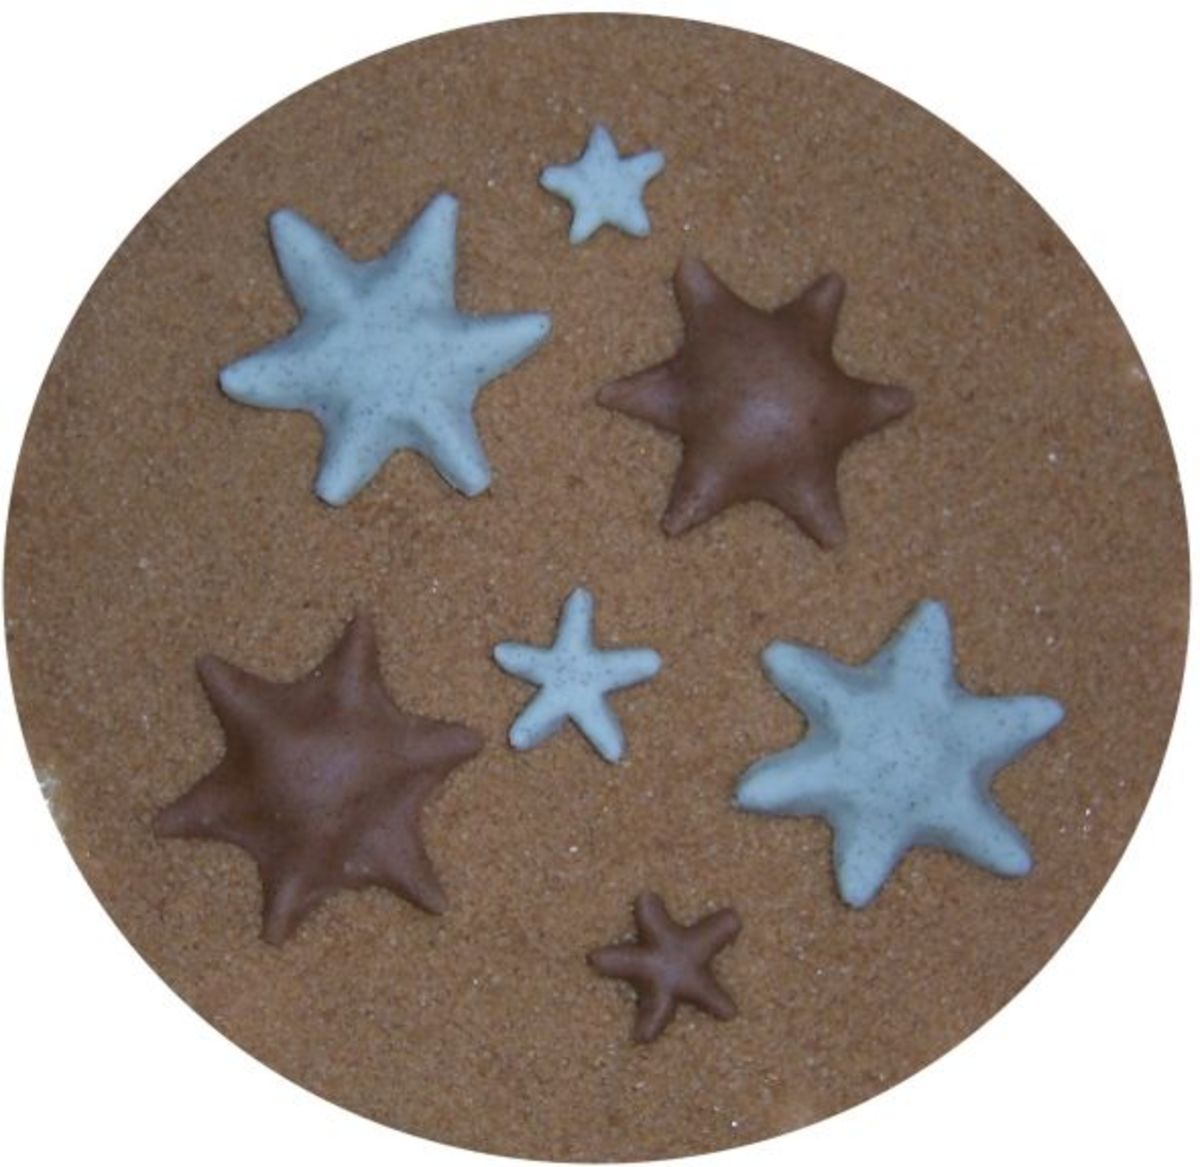 Asterina starfish made of fondant